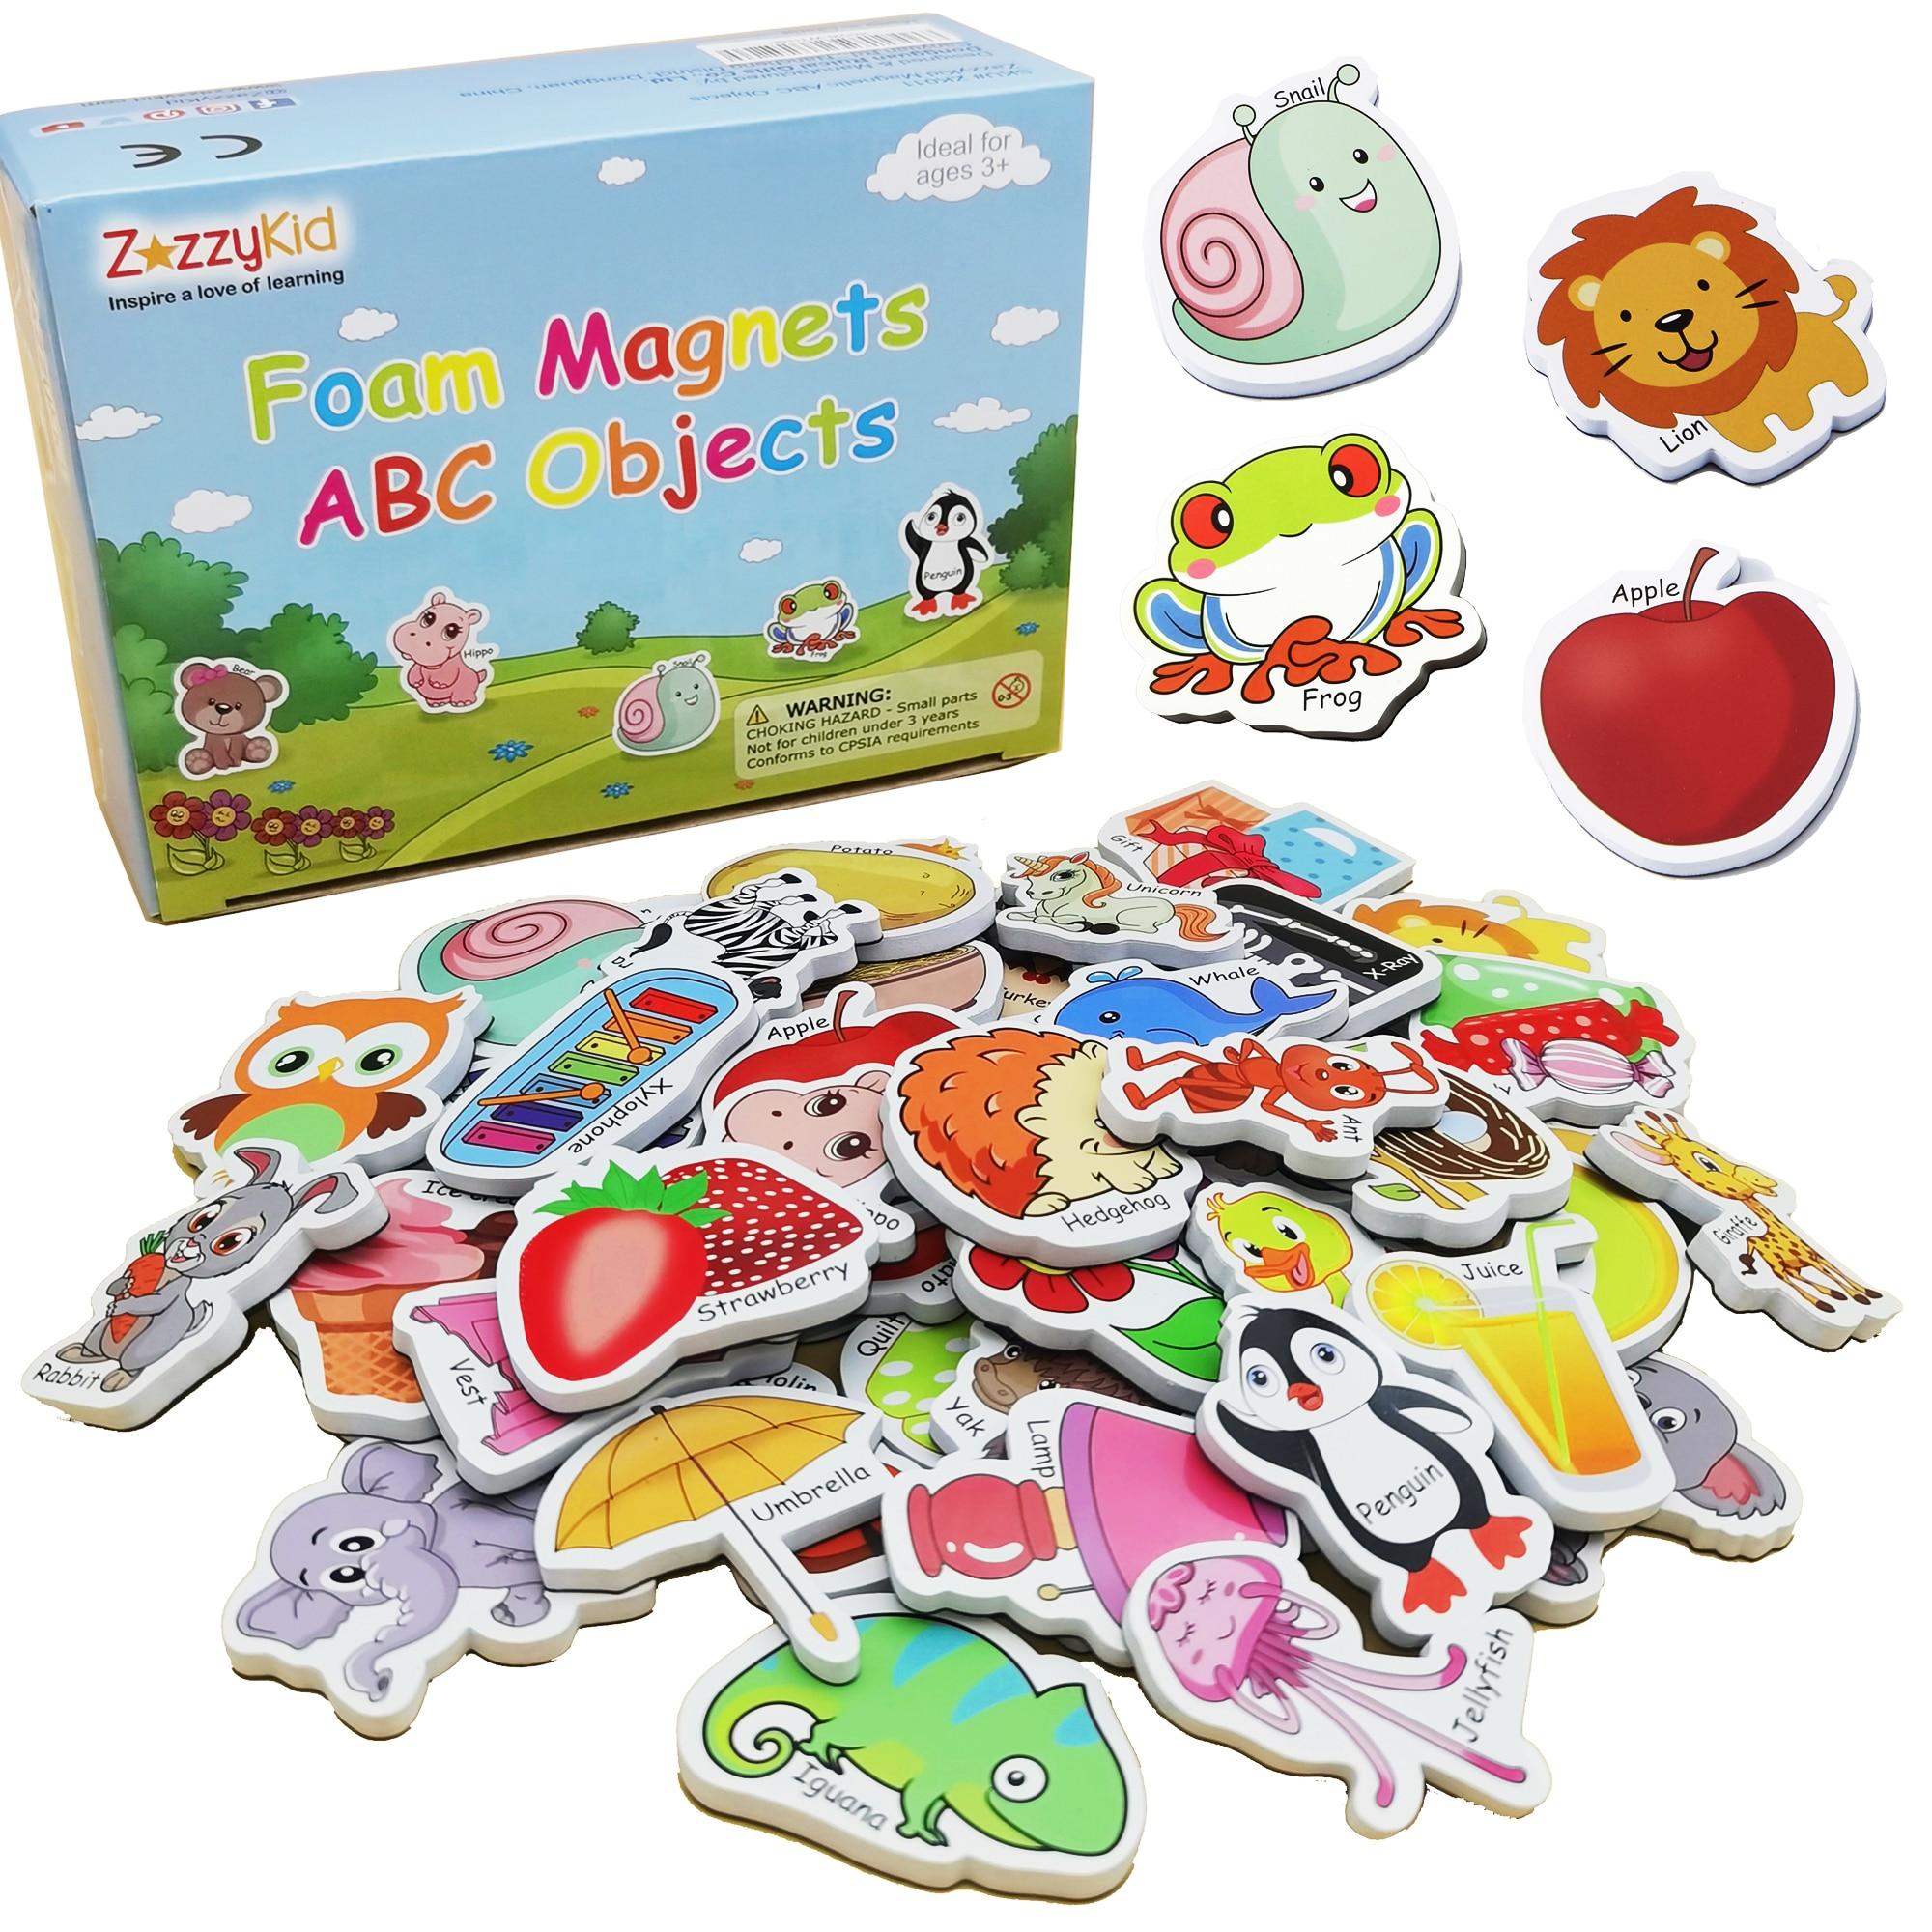 ZazzyKid كائنات رغوية مغناطيسية للأطفال: 52 لعبة من ABC الأبجدية مغناطيس الثلاجة للطفل التعليم المبكر